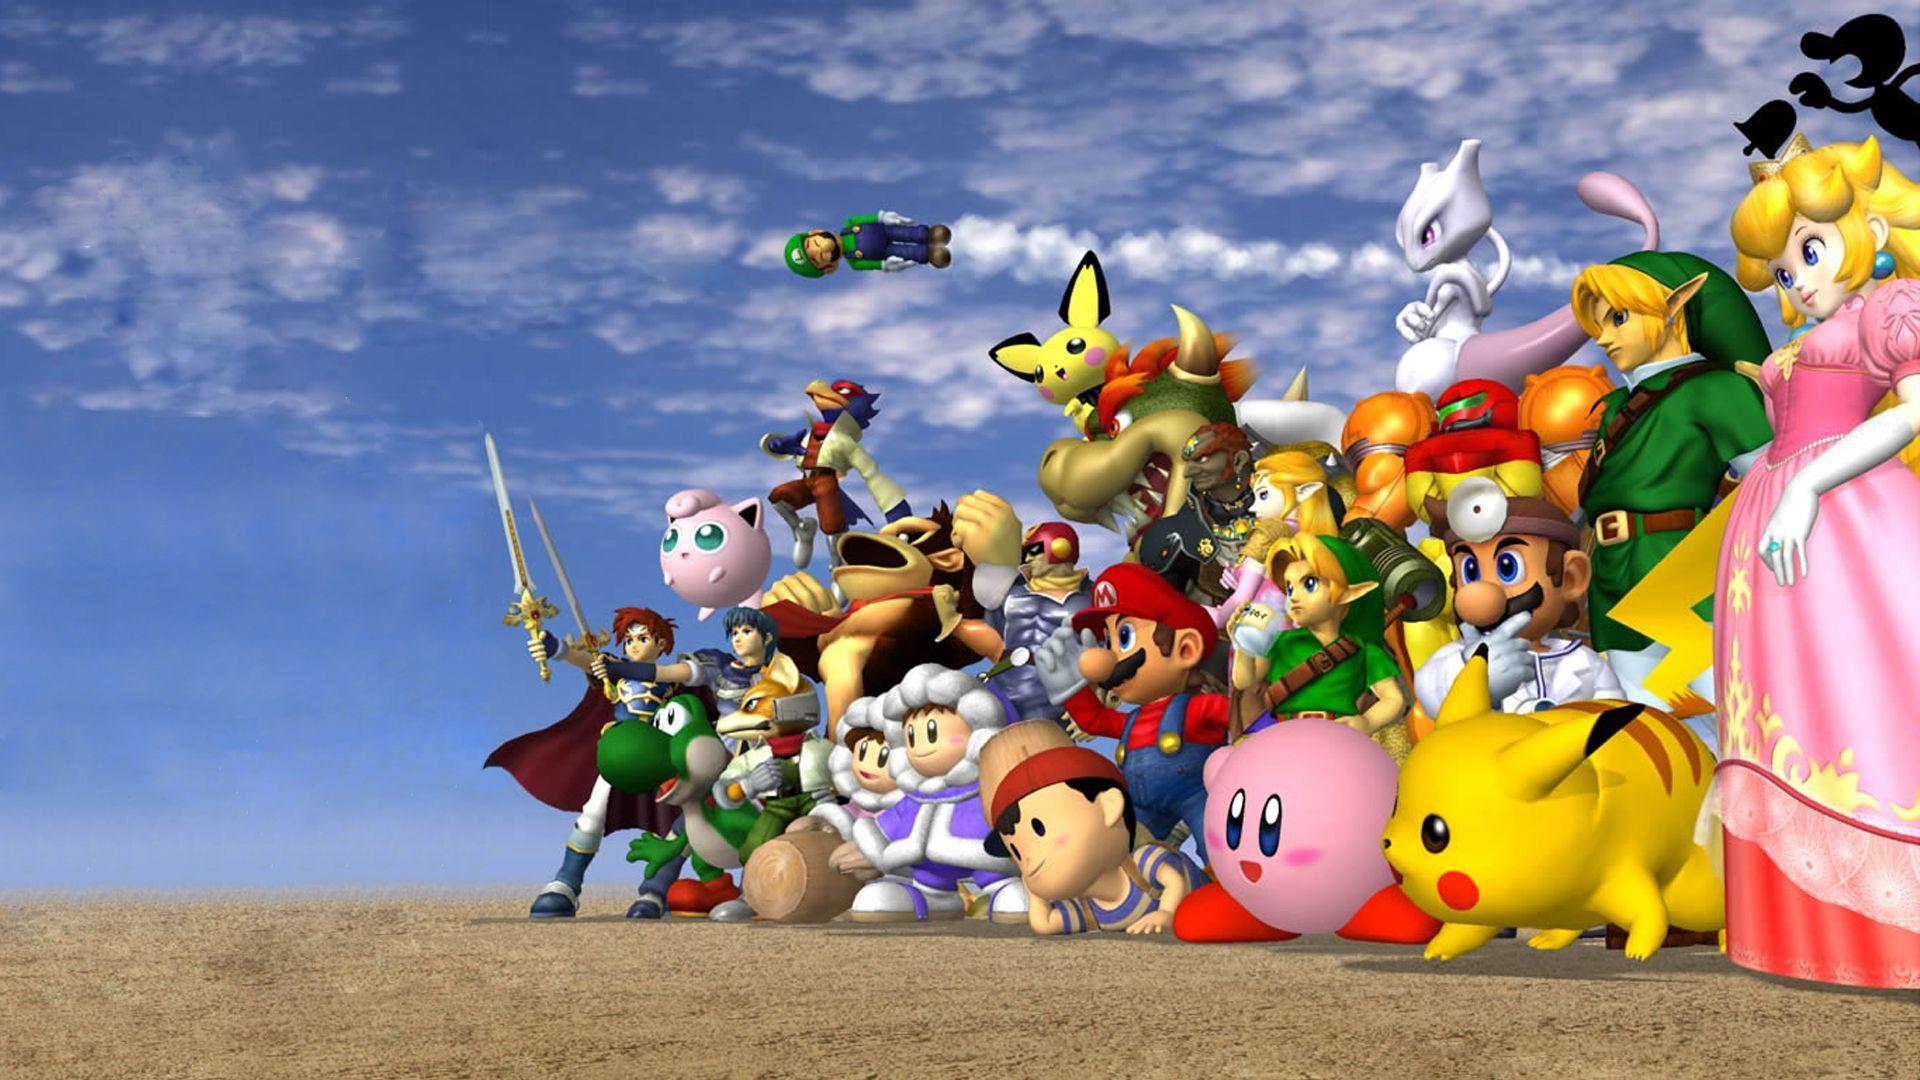 Nintendo Direct Wallpapers Wallpaper Cave